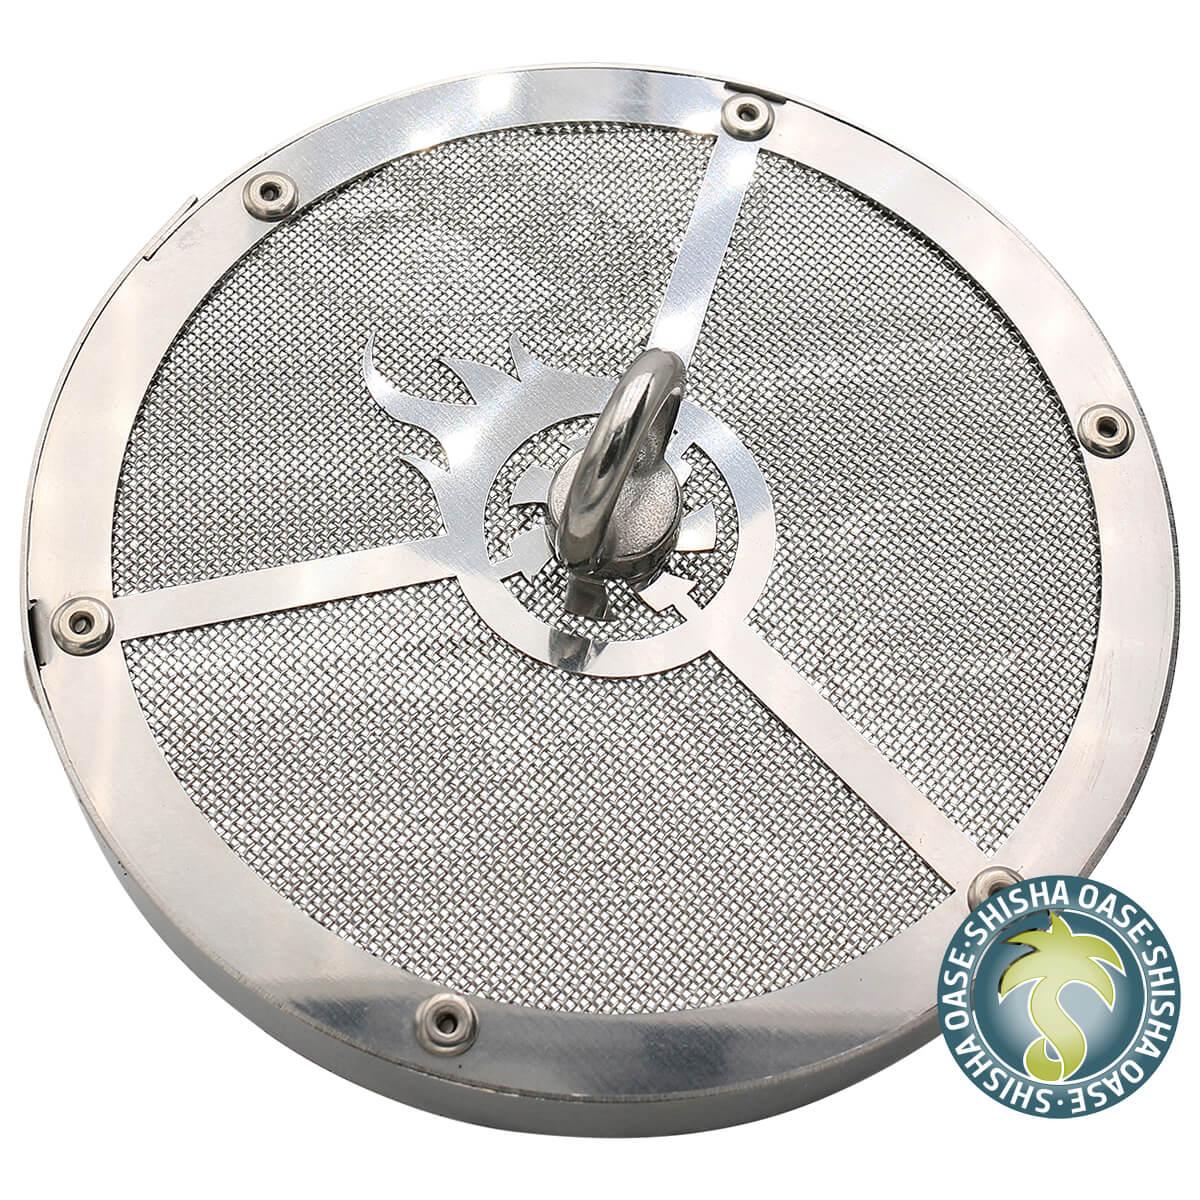 Shisha-Turbine Booster - Edelstahl